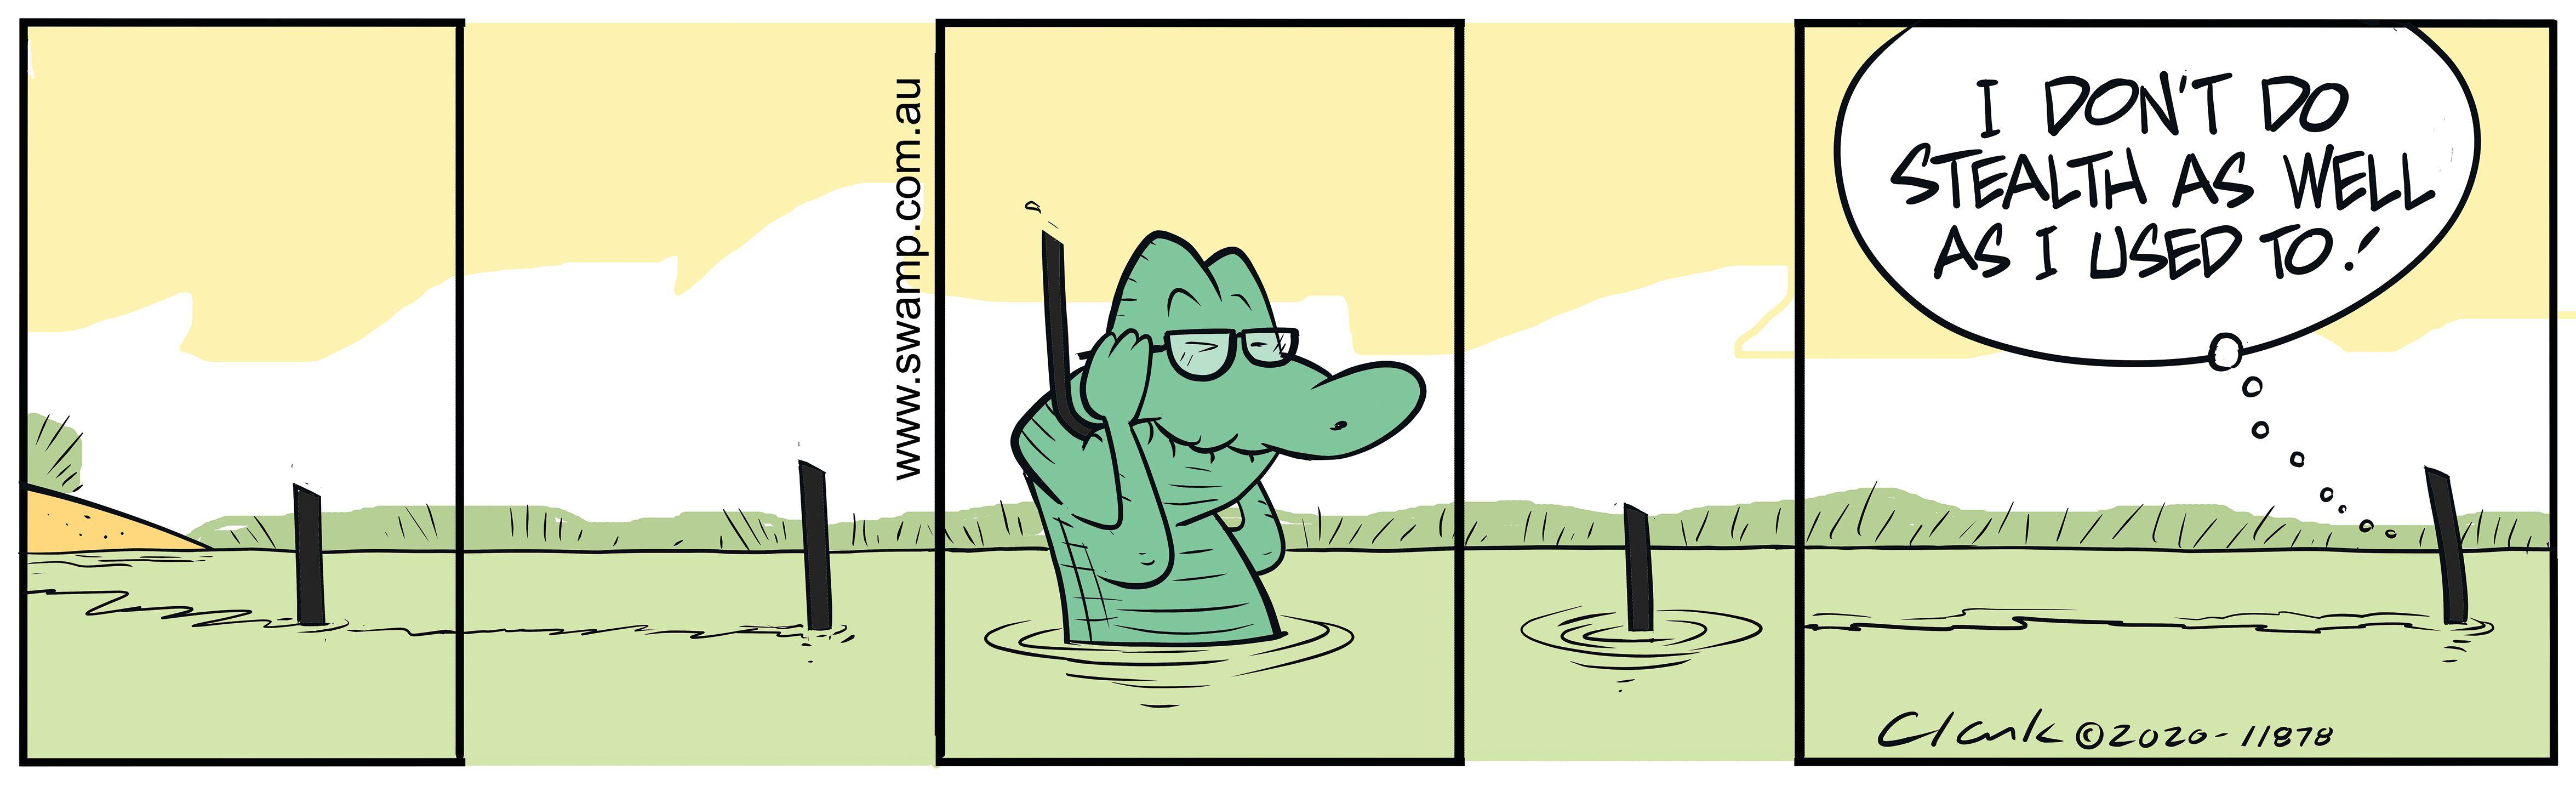 Old Man Croc Stealth